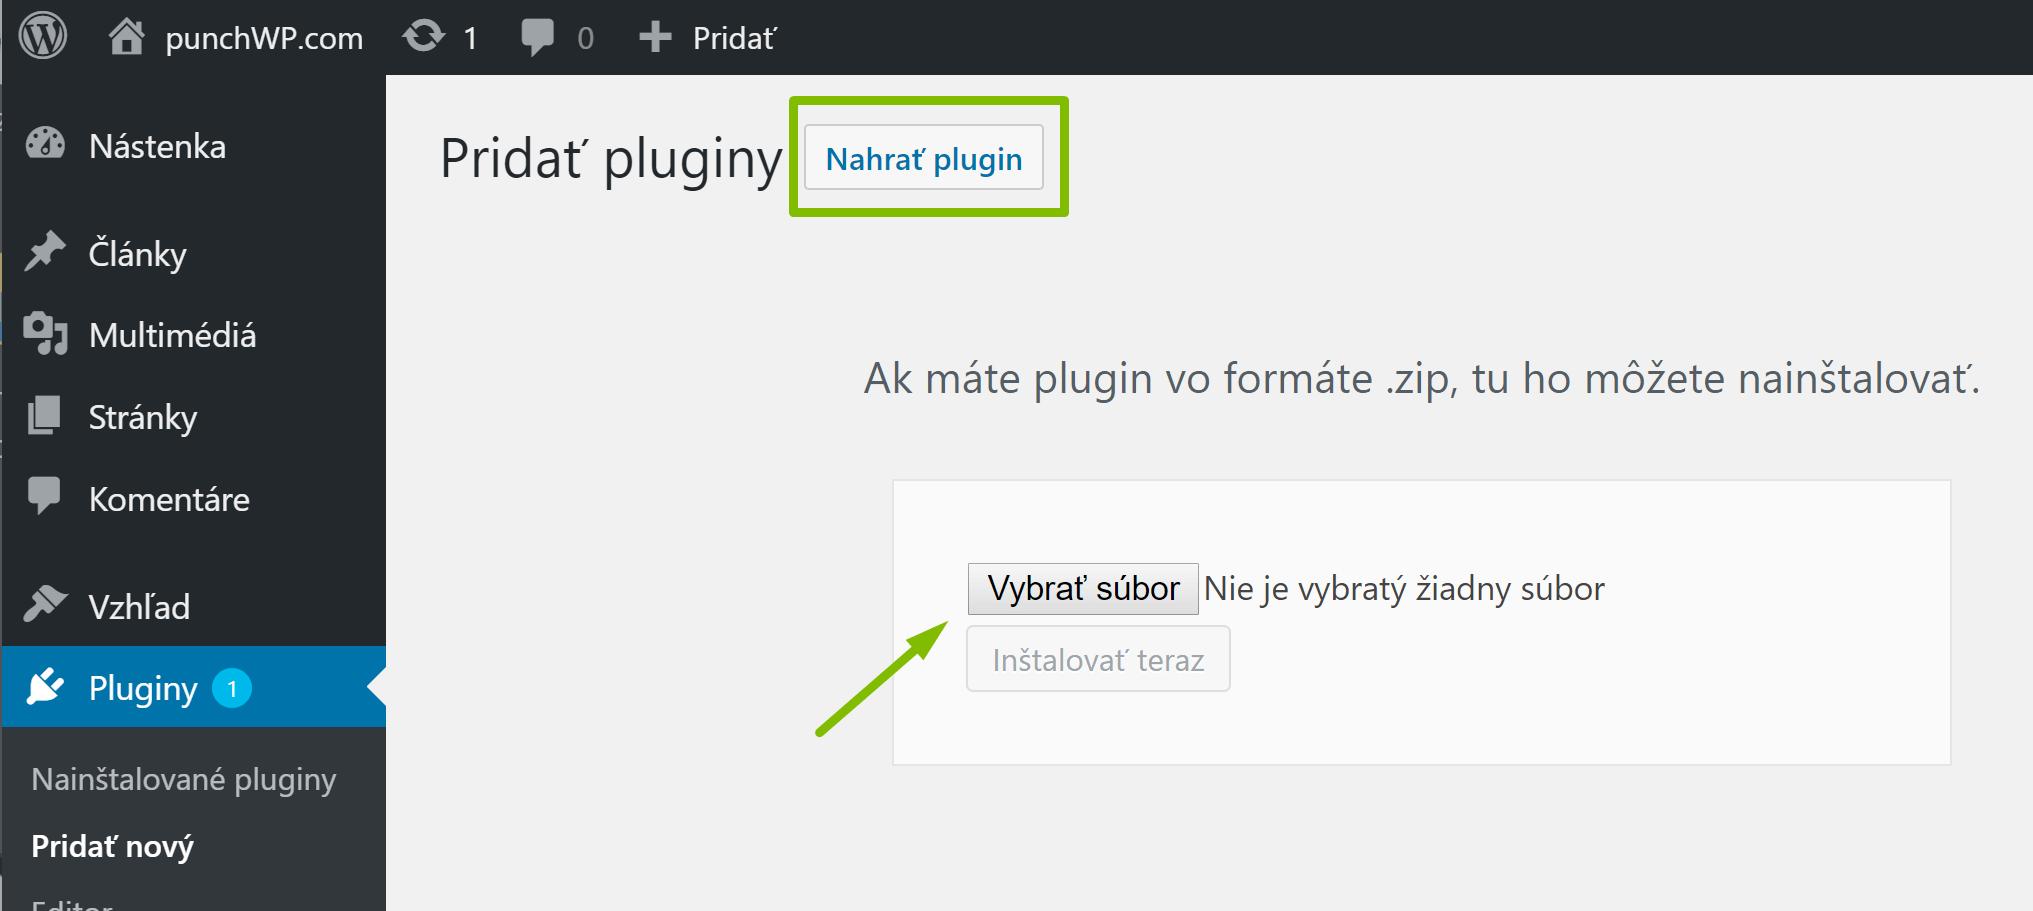 Nahrať plugin